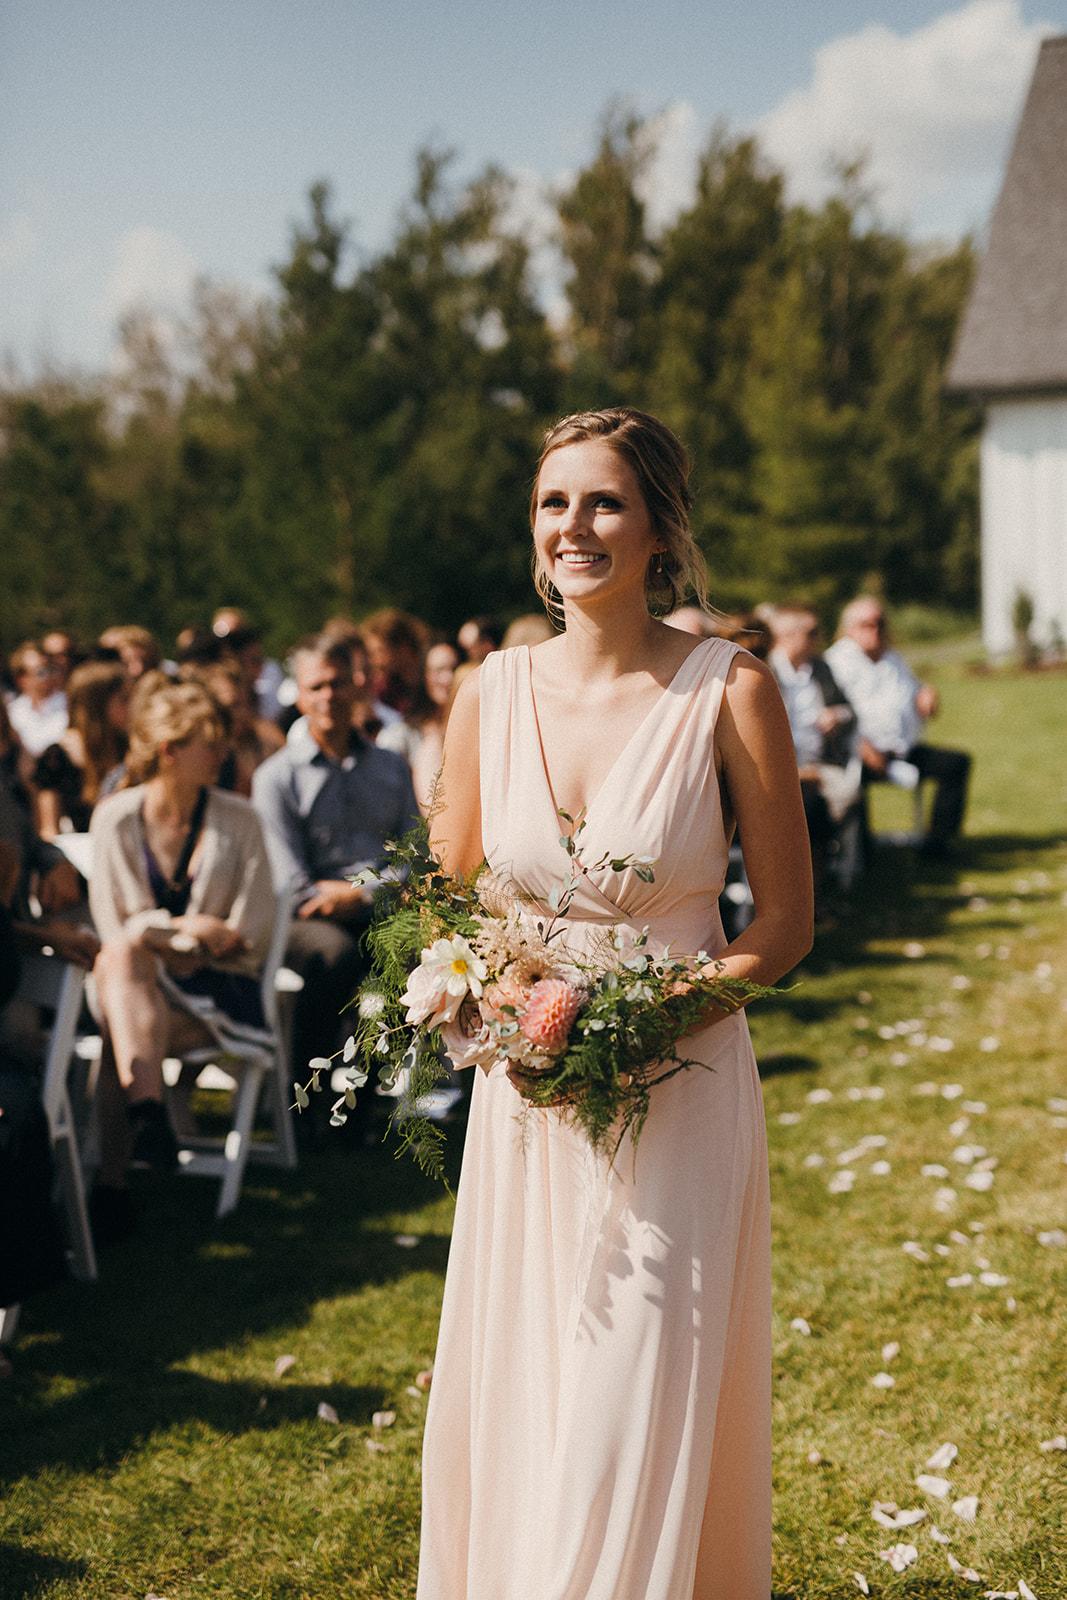 kaden_justine_wedding_1154.jpg